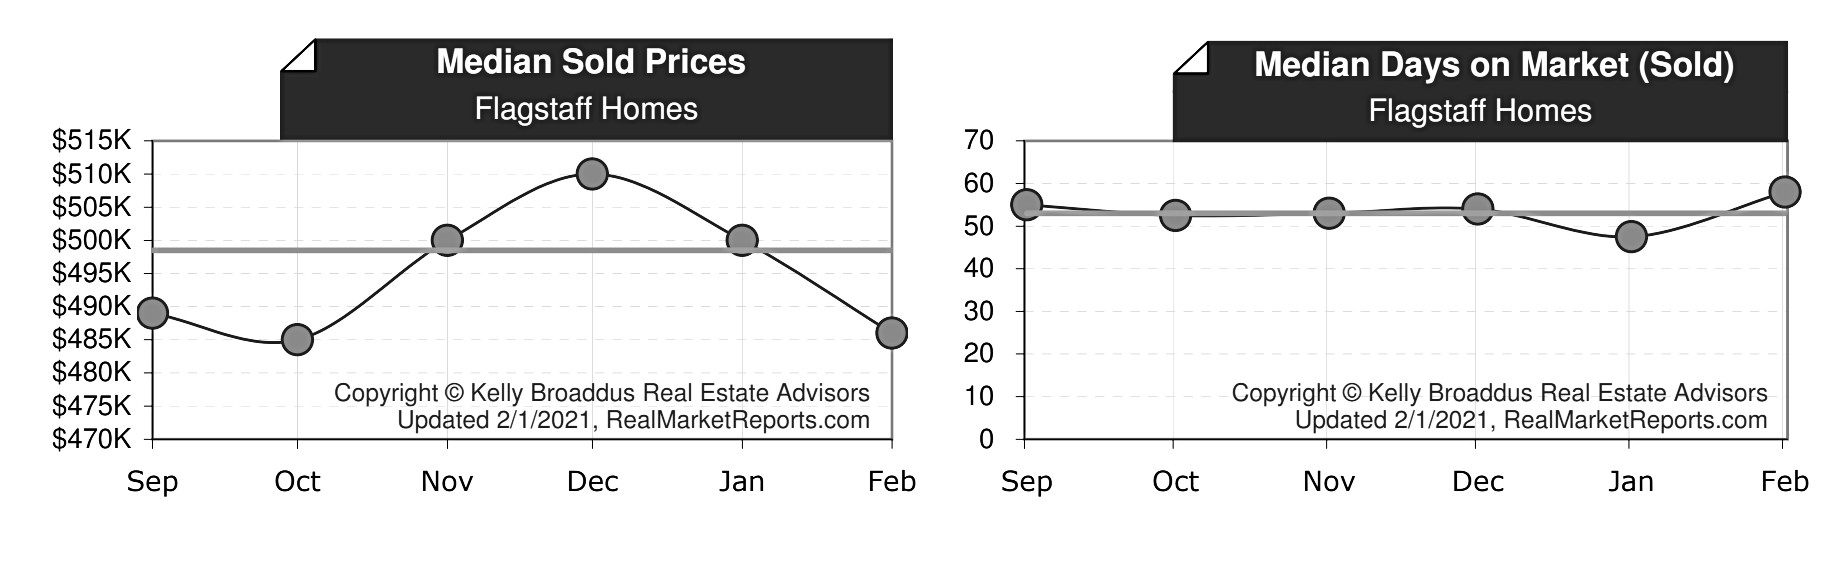 Flagstaff Median Home Price & DOM Jan 2021